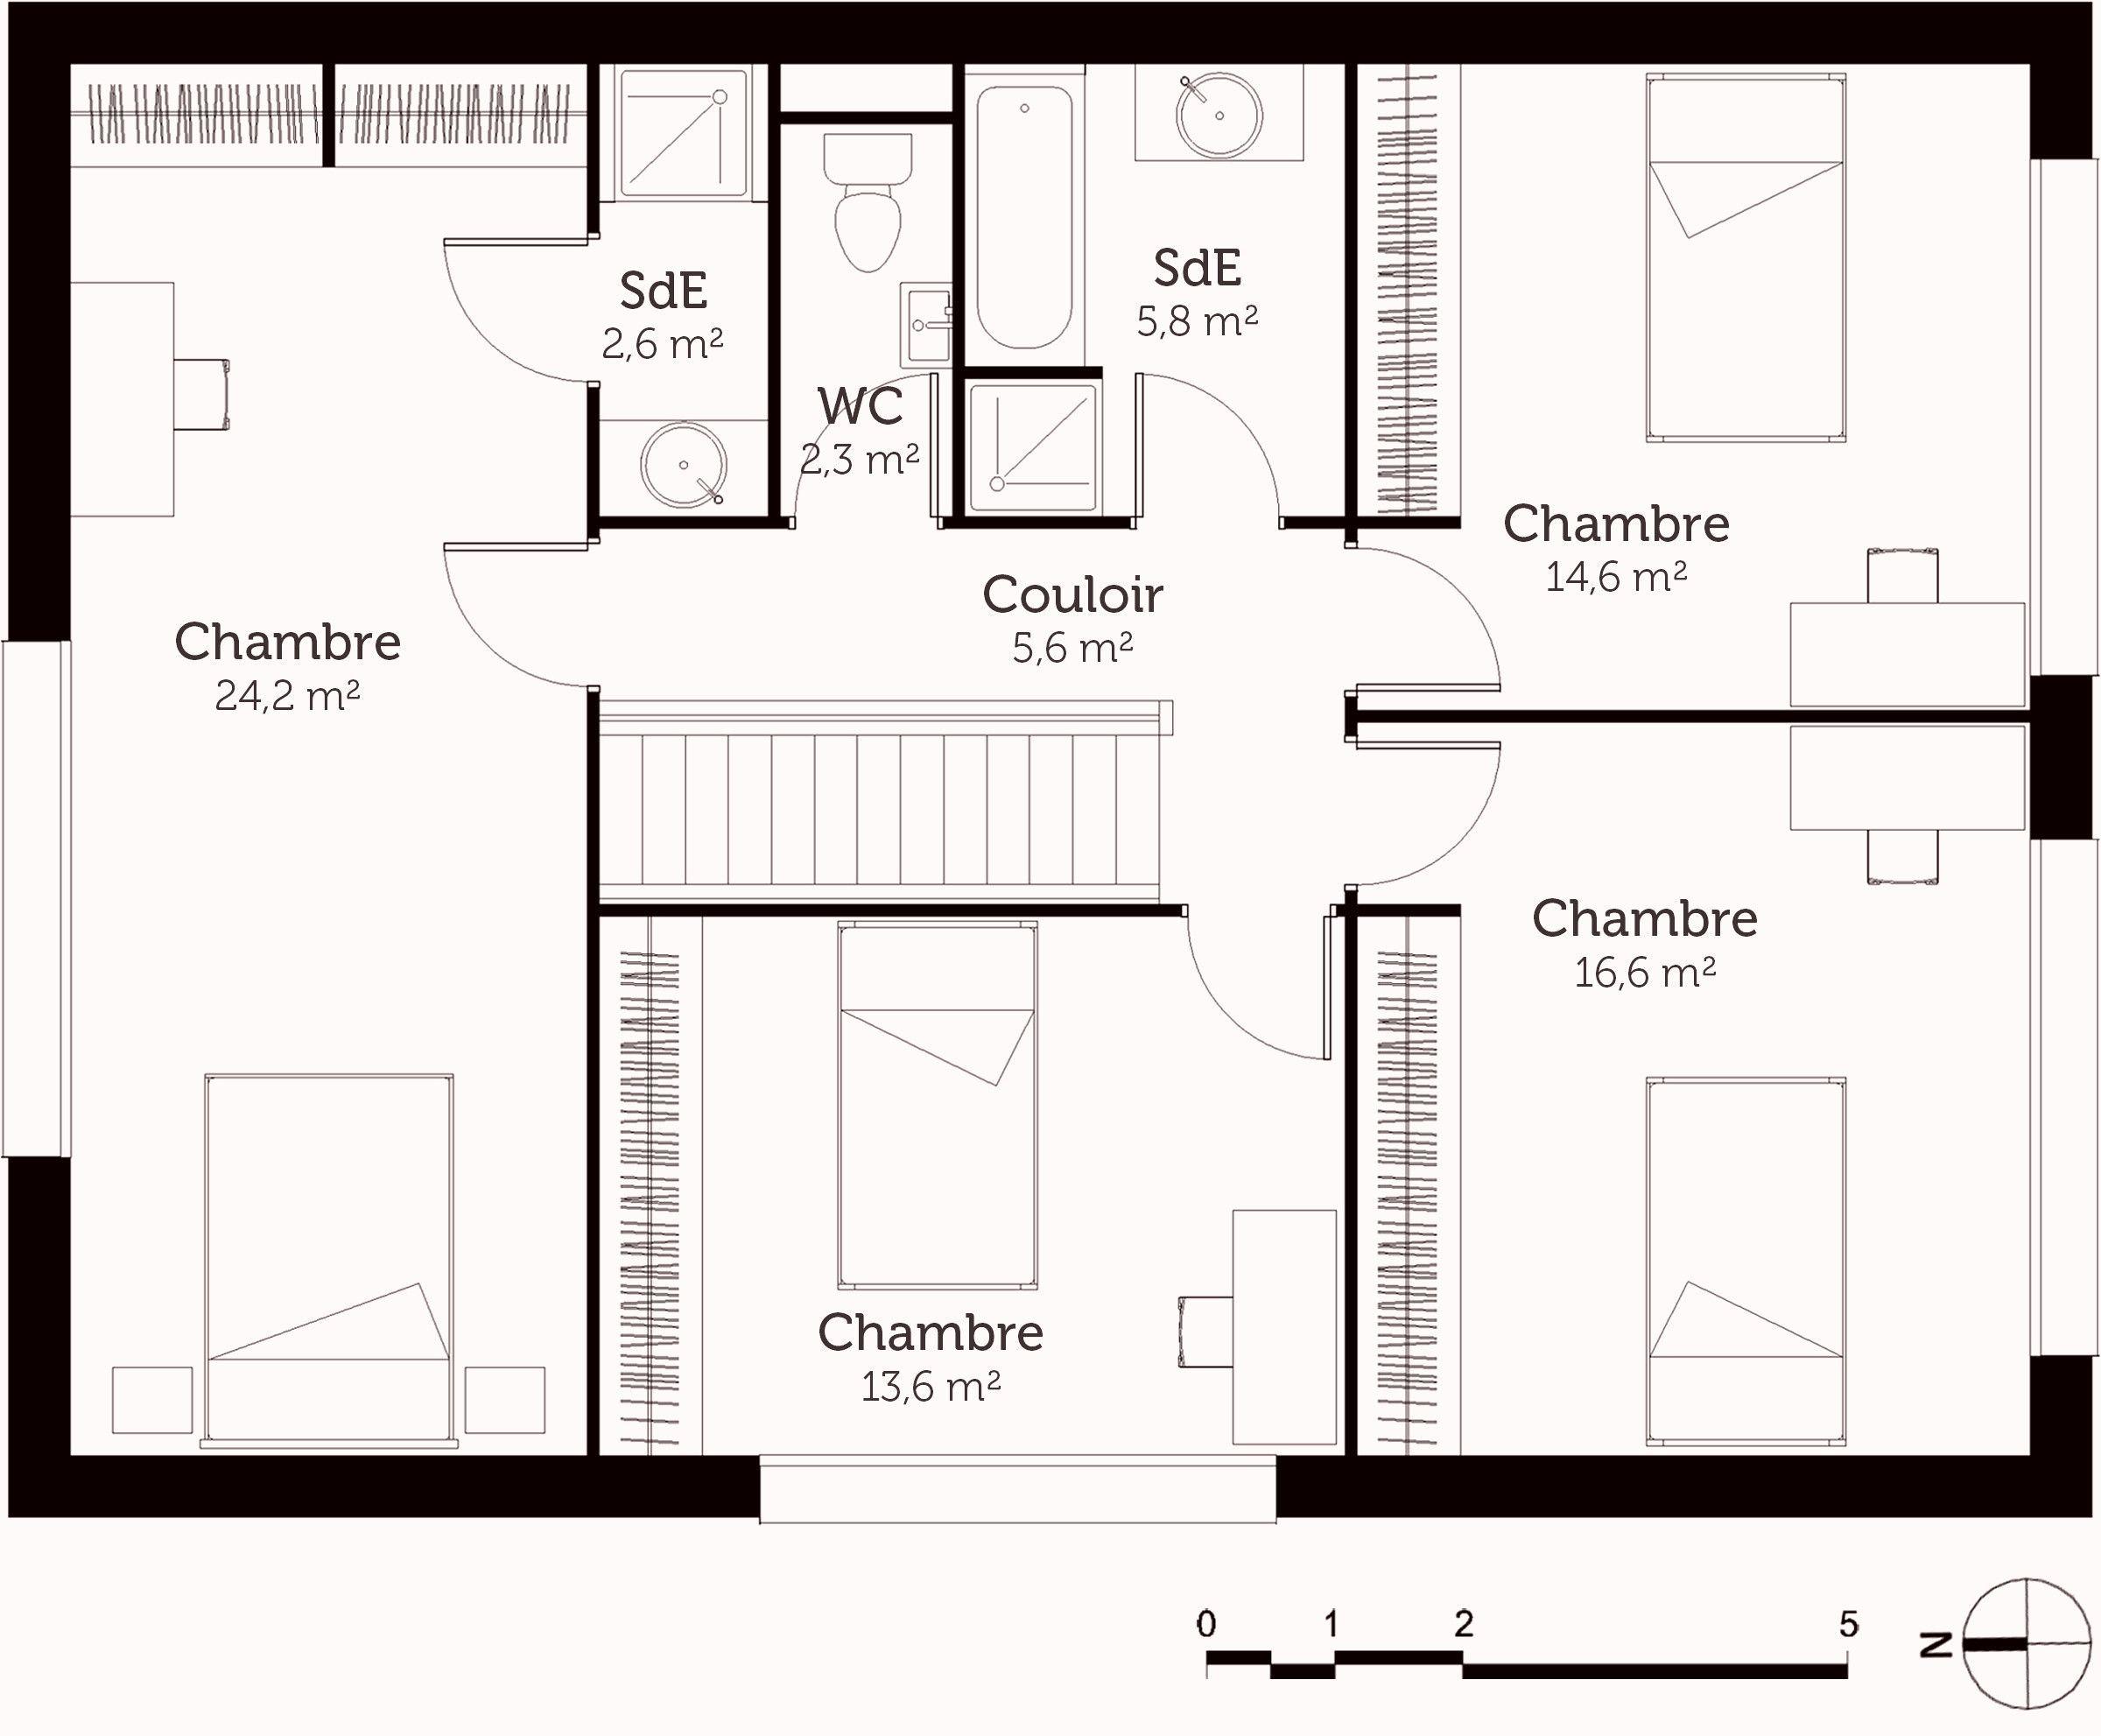 Fresh Plan Maison 6 Chambres